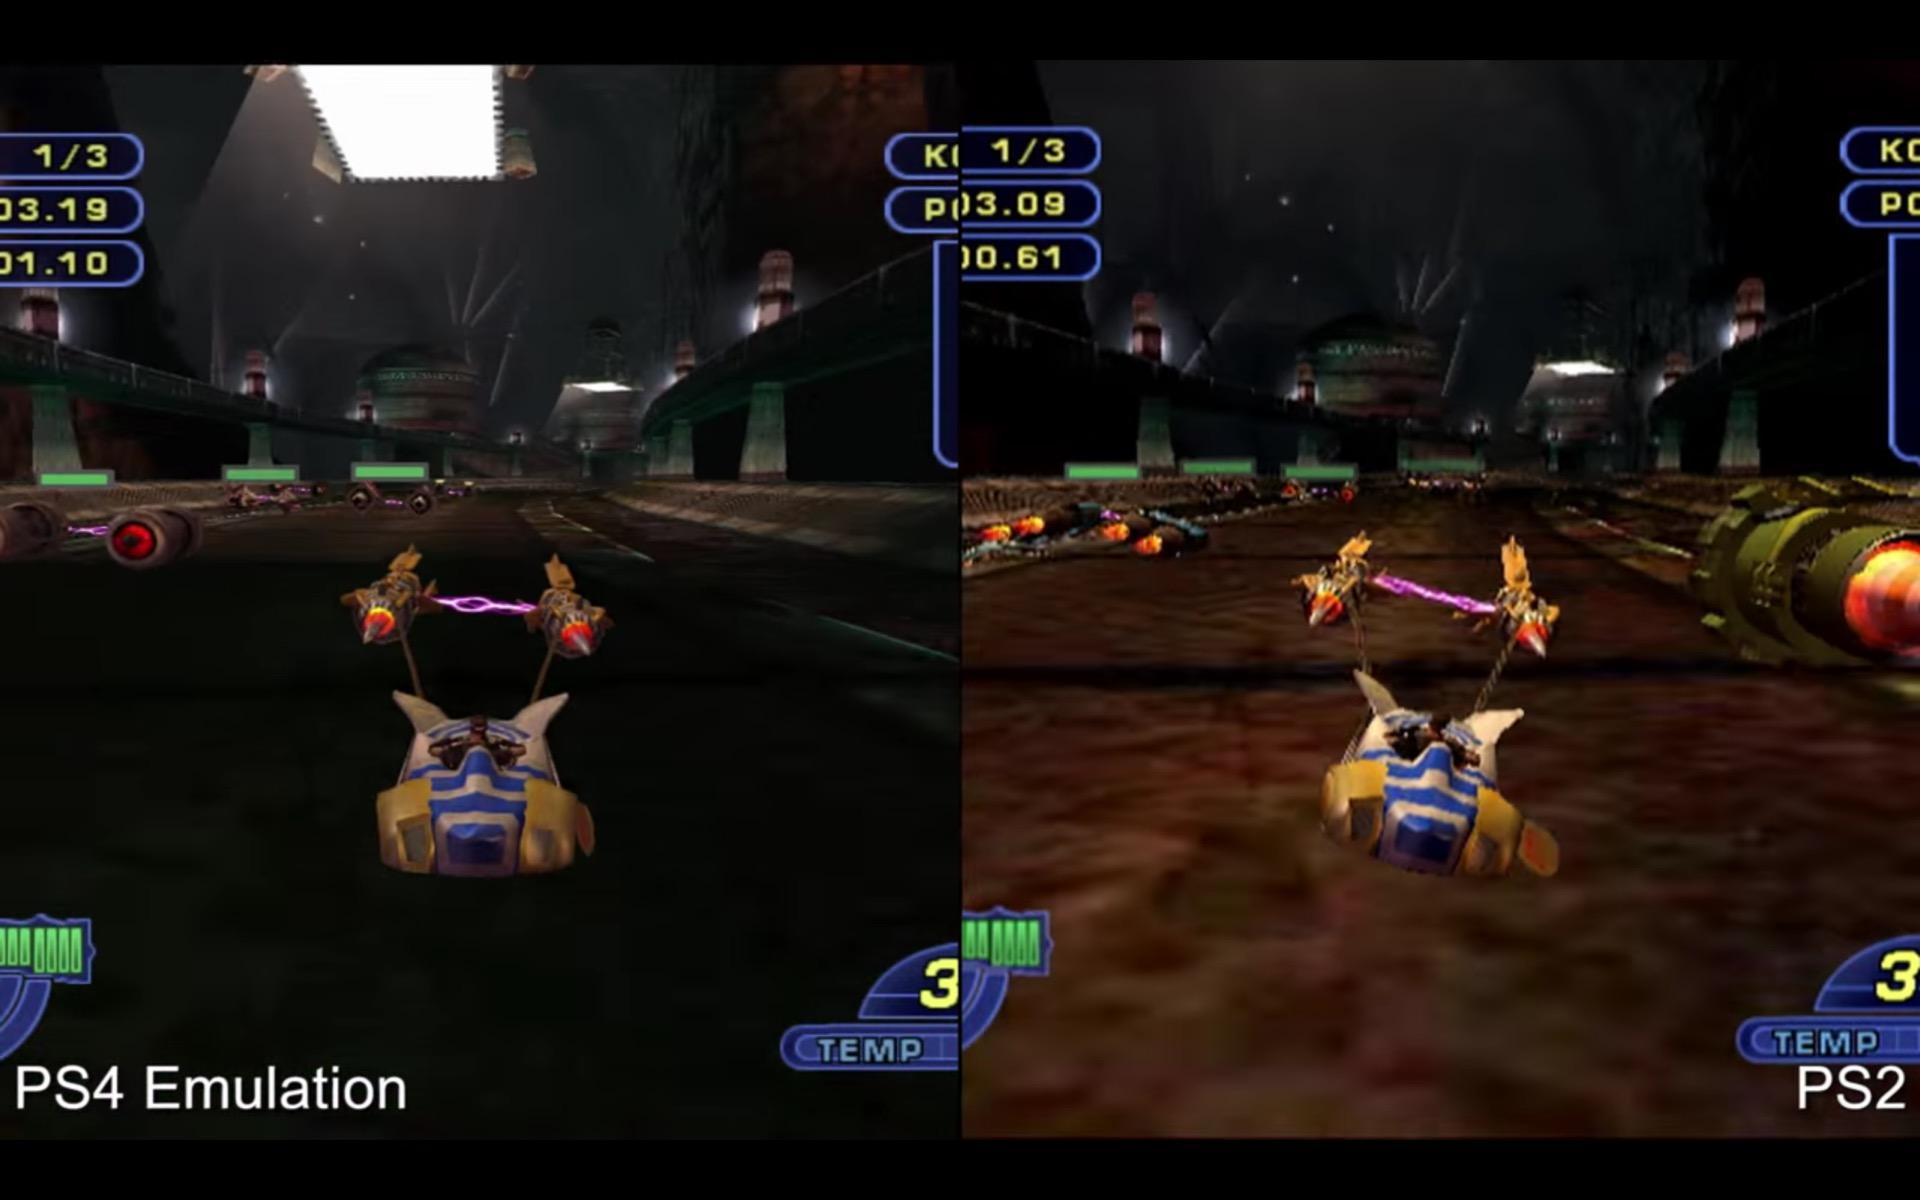 PS4 emulation2